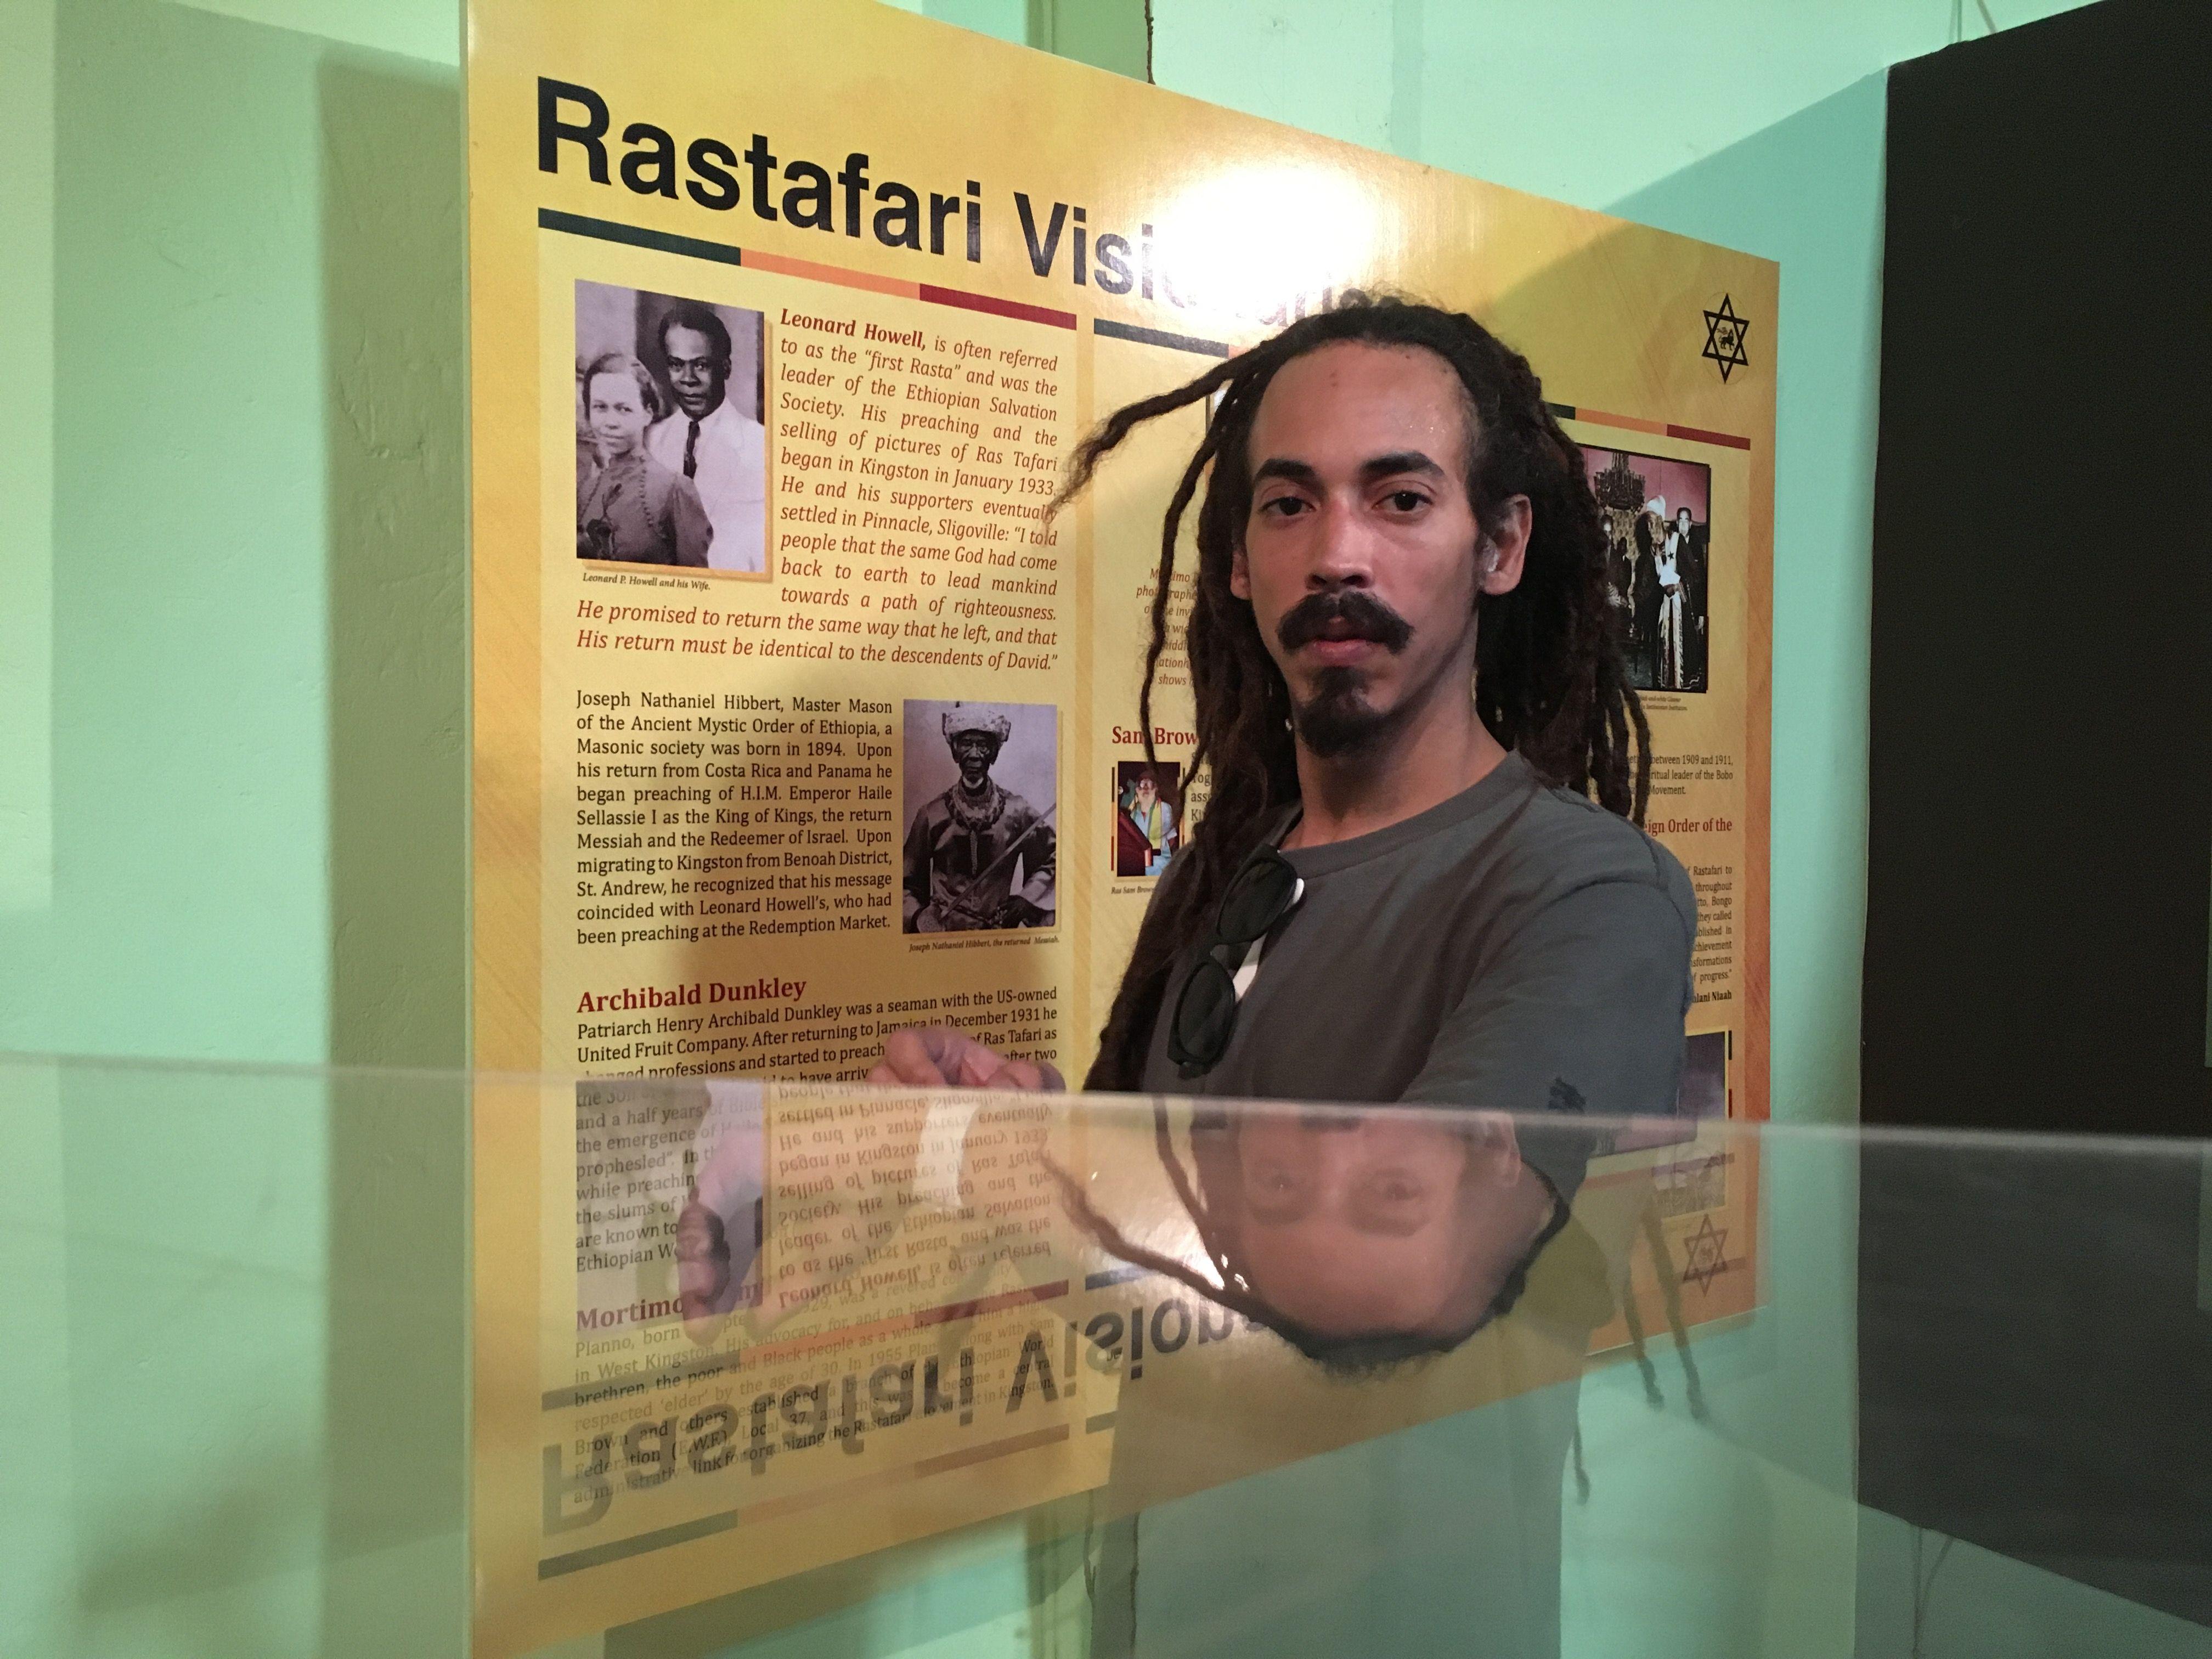 Pin By Thelovelaw On Rastafari Rastafari